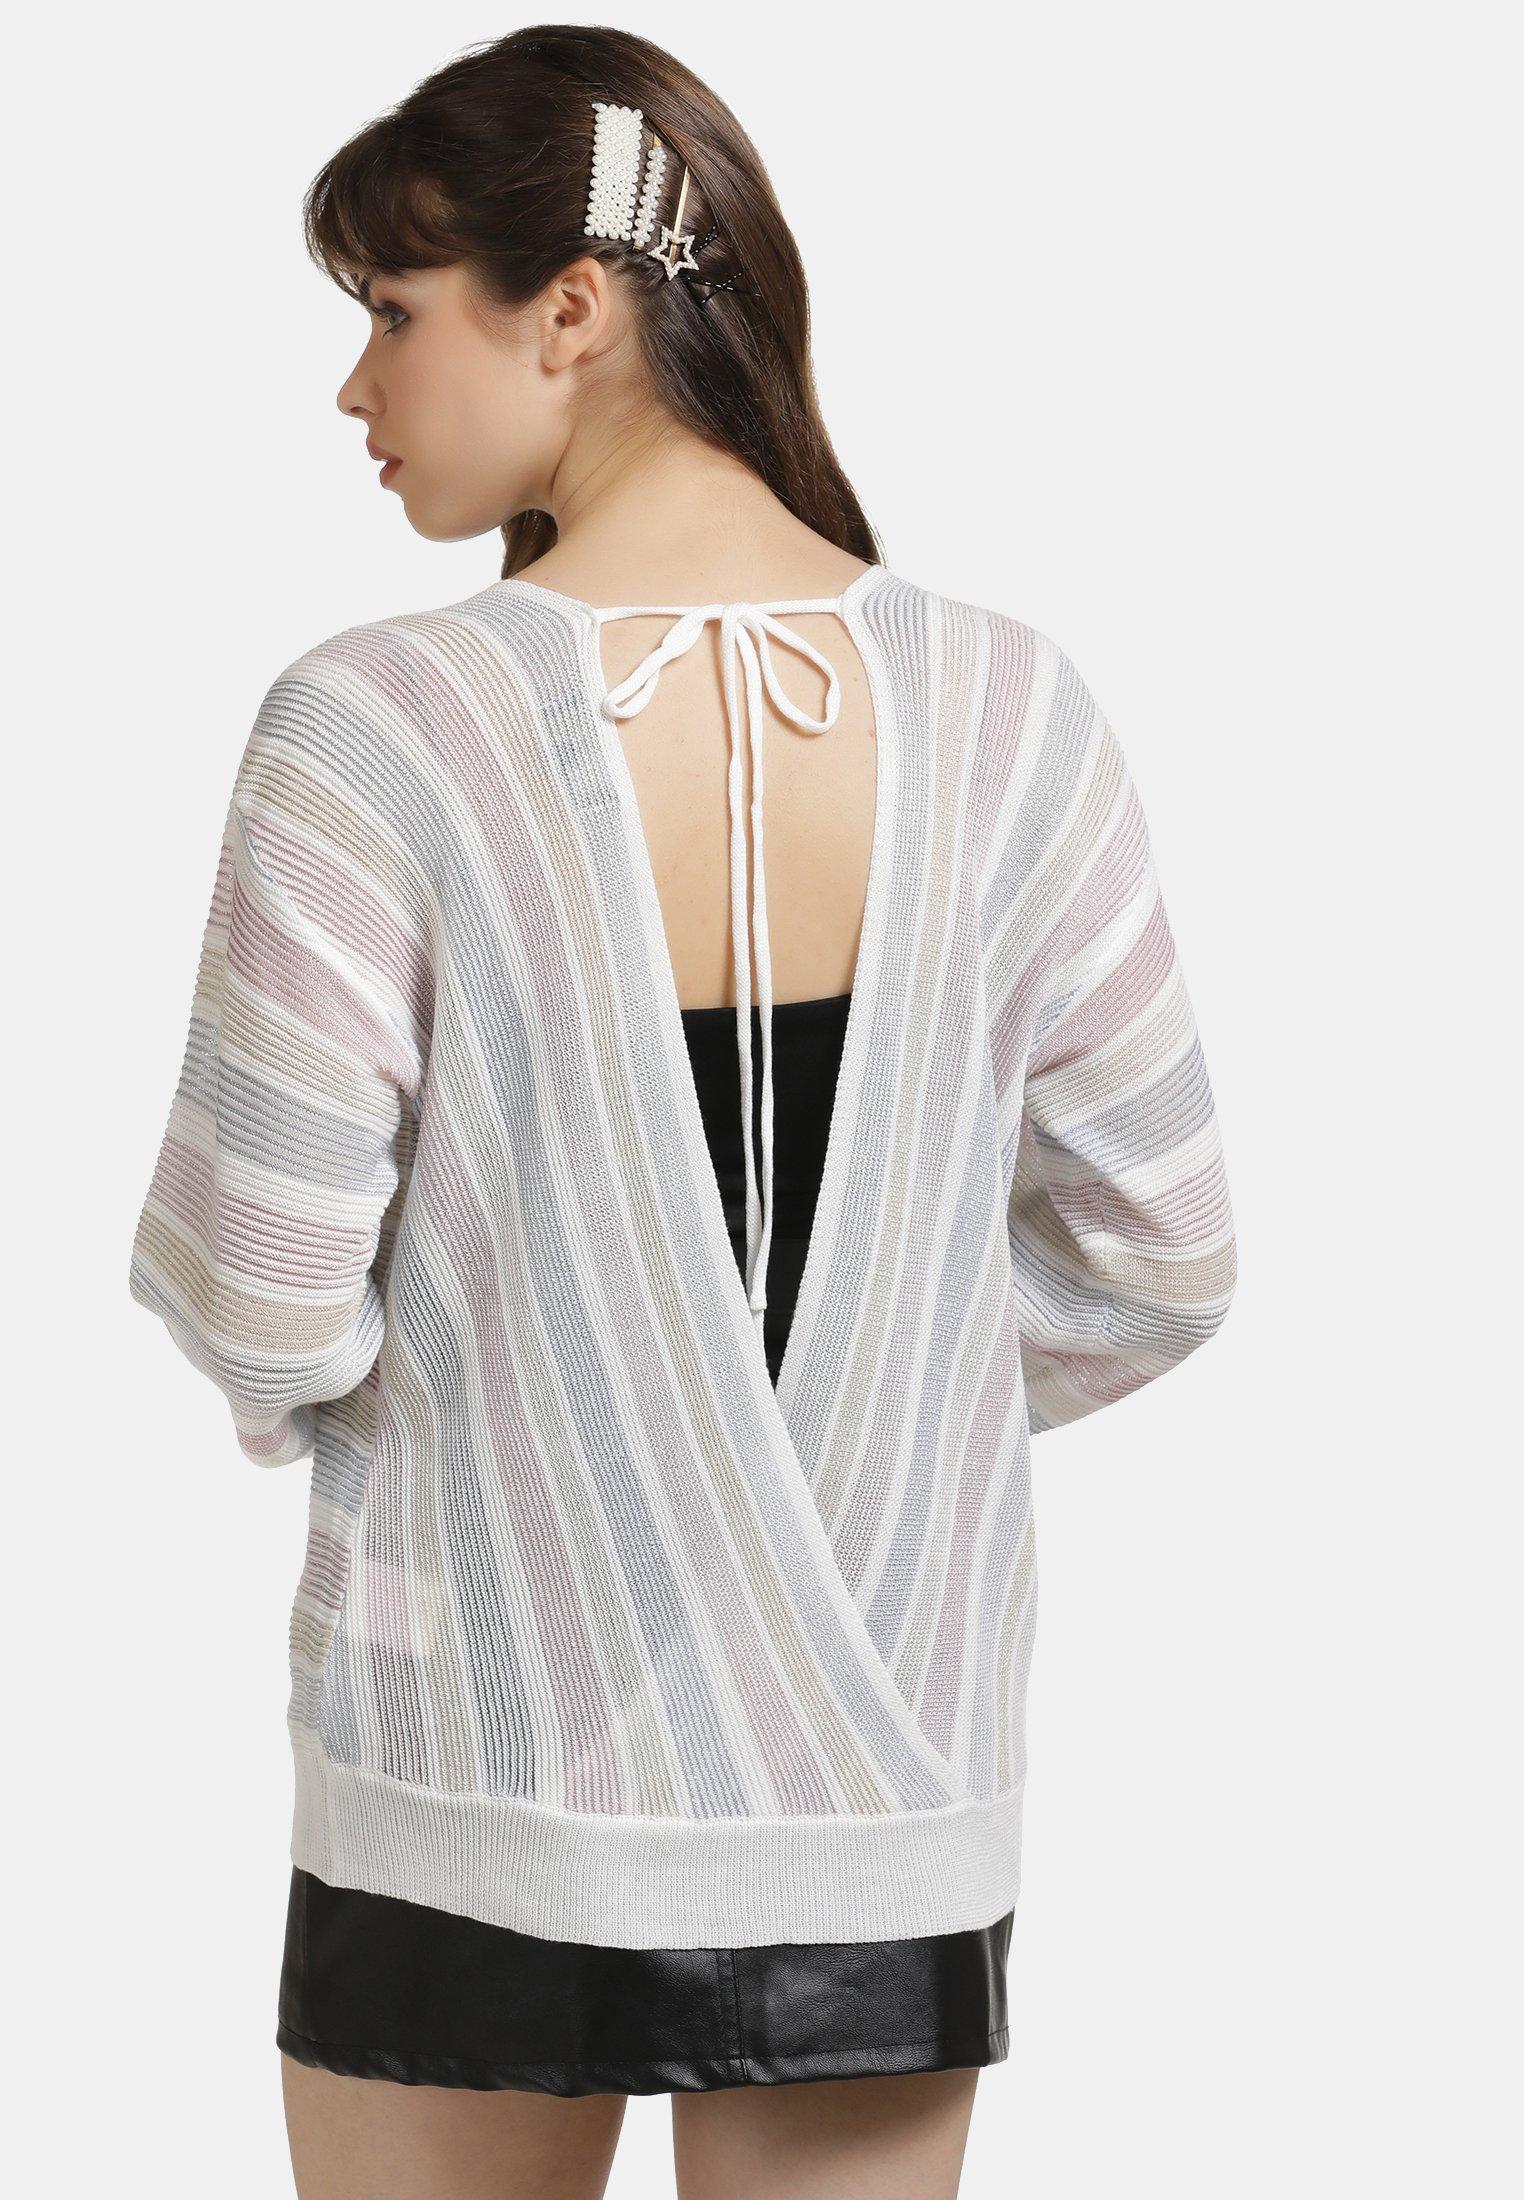 2020 New Women's Clothing myMo Jumper white 78orXubRw